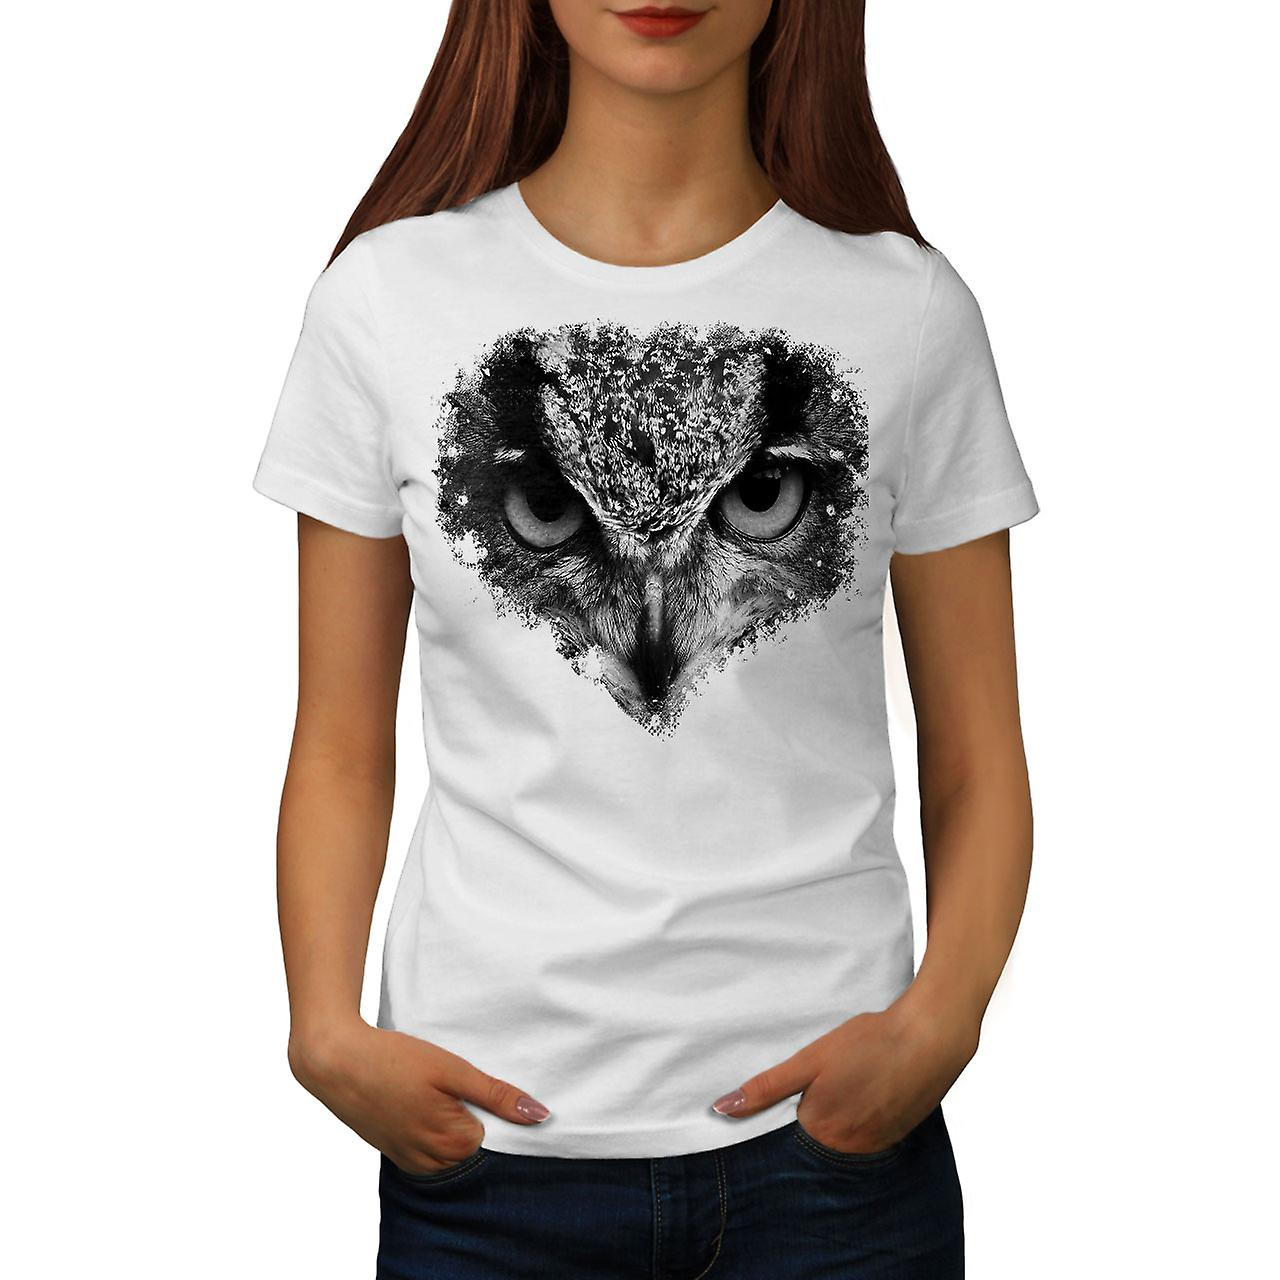 Owl Look Eye Cute Animal Women Long Sleeve T-shirt NEWWellcoda